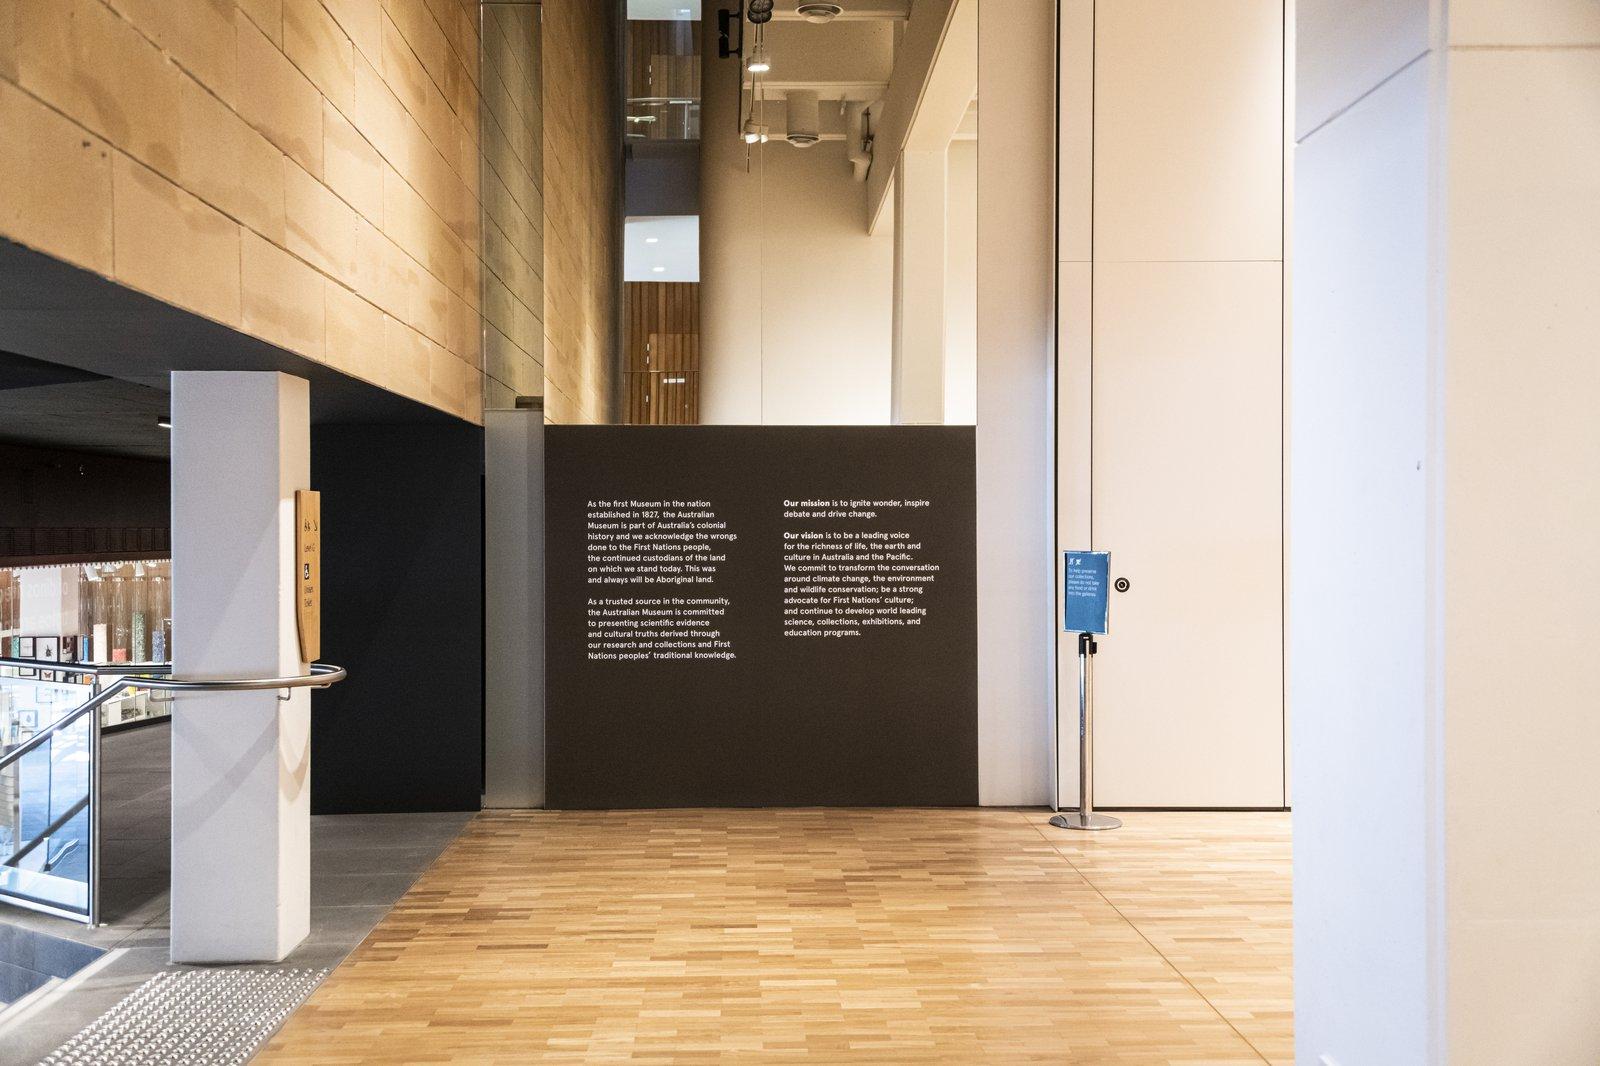 Statement of Reflection - Hintze Hall